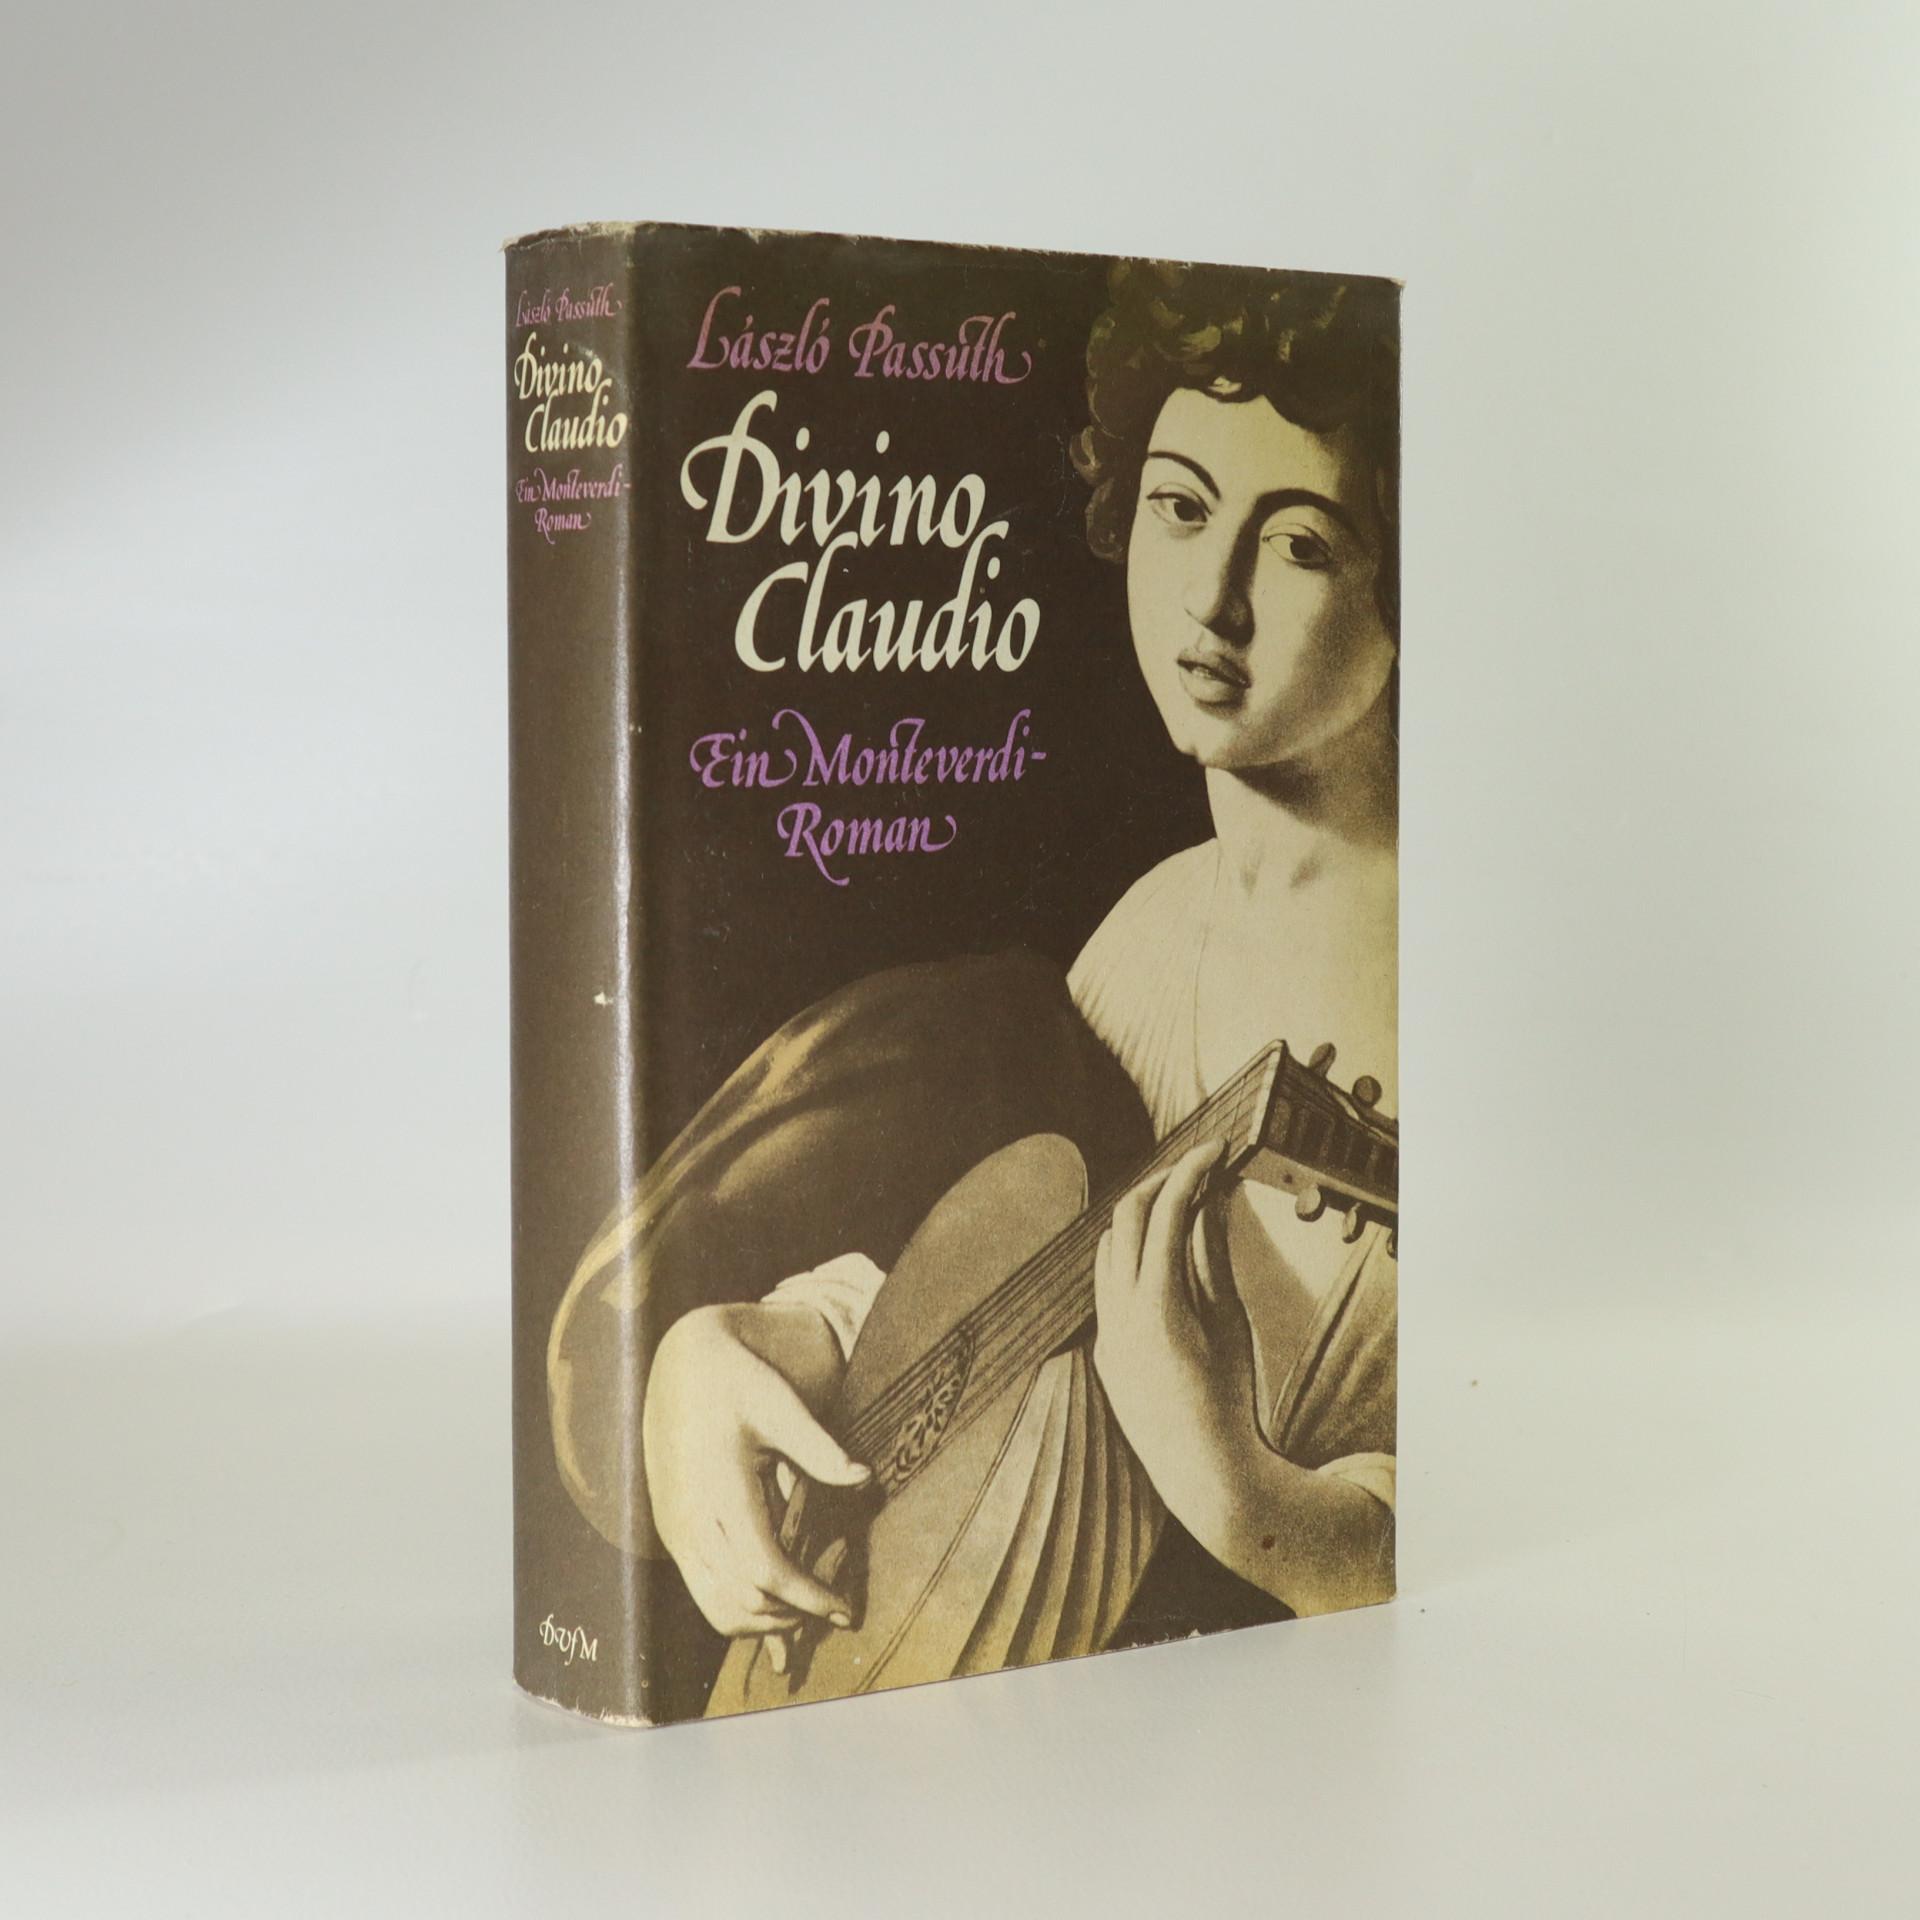 antikvární kniha Divino Claudio, neuveden